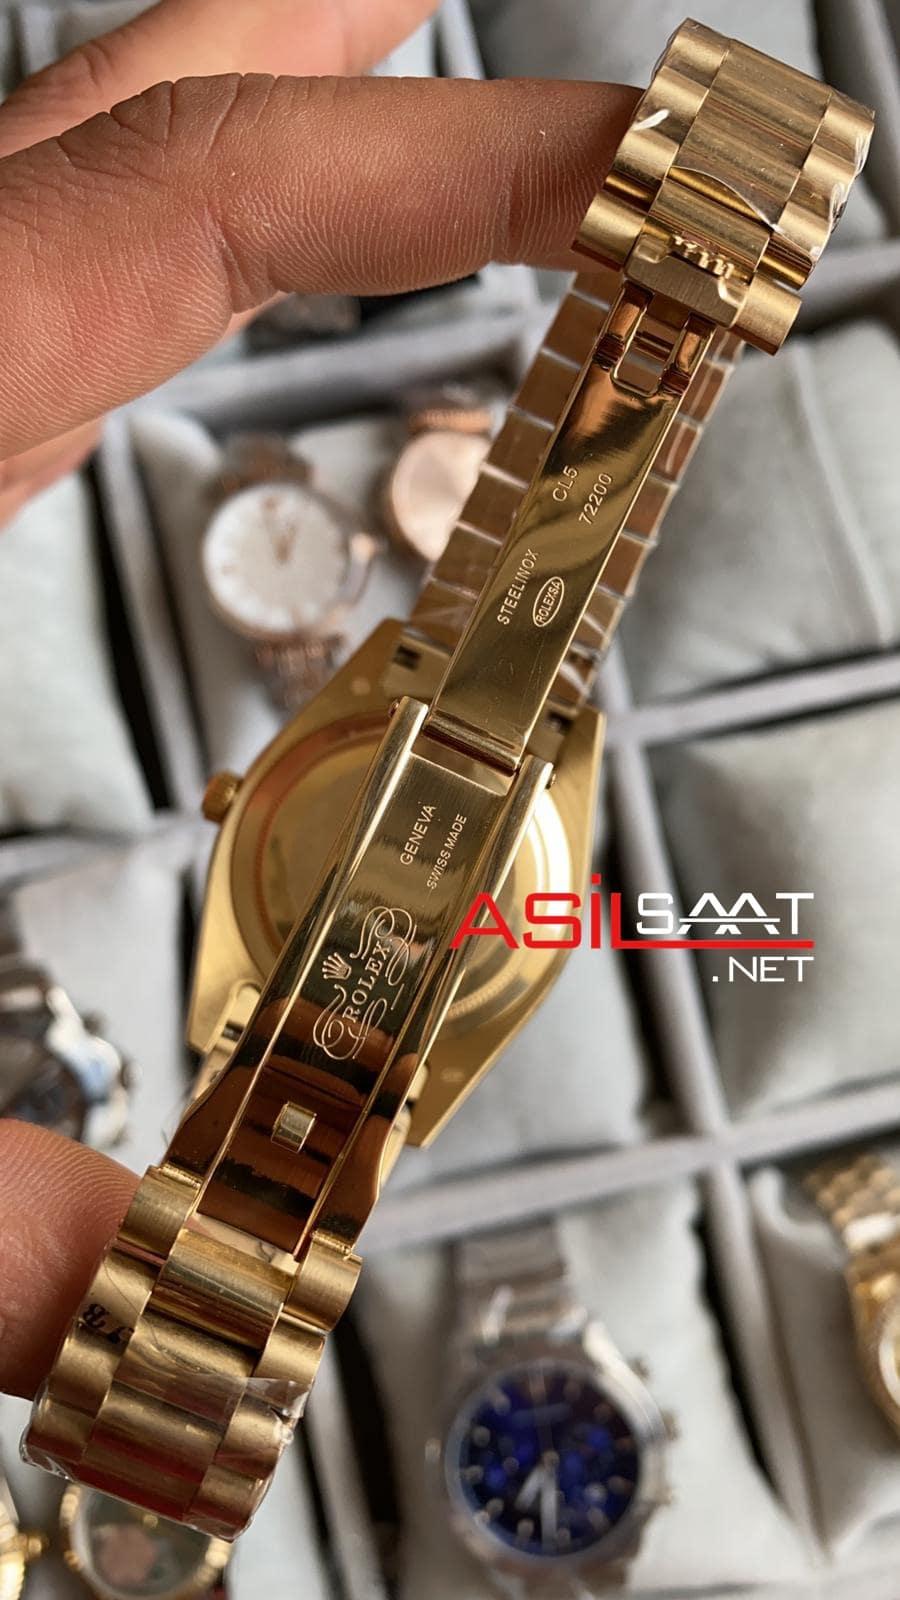 Rolex Day Date Gold Replika Saat ROLDD062